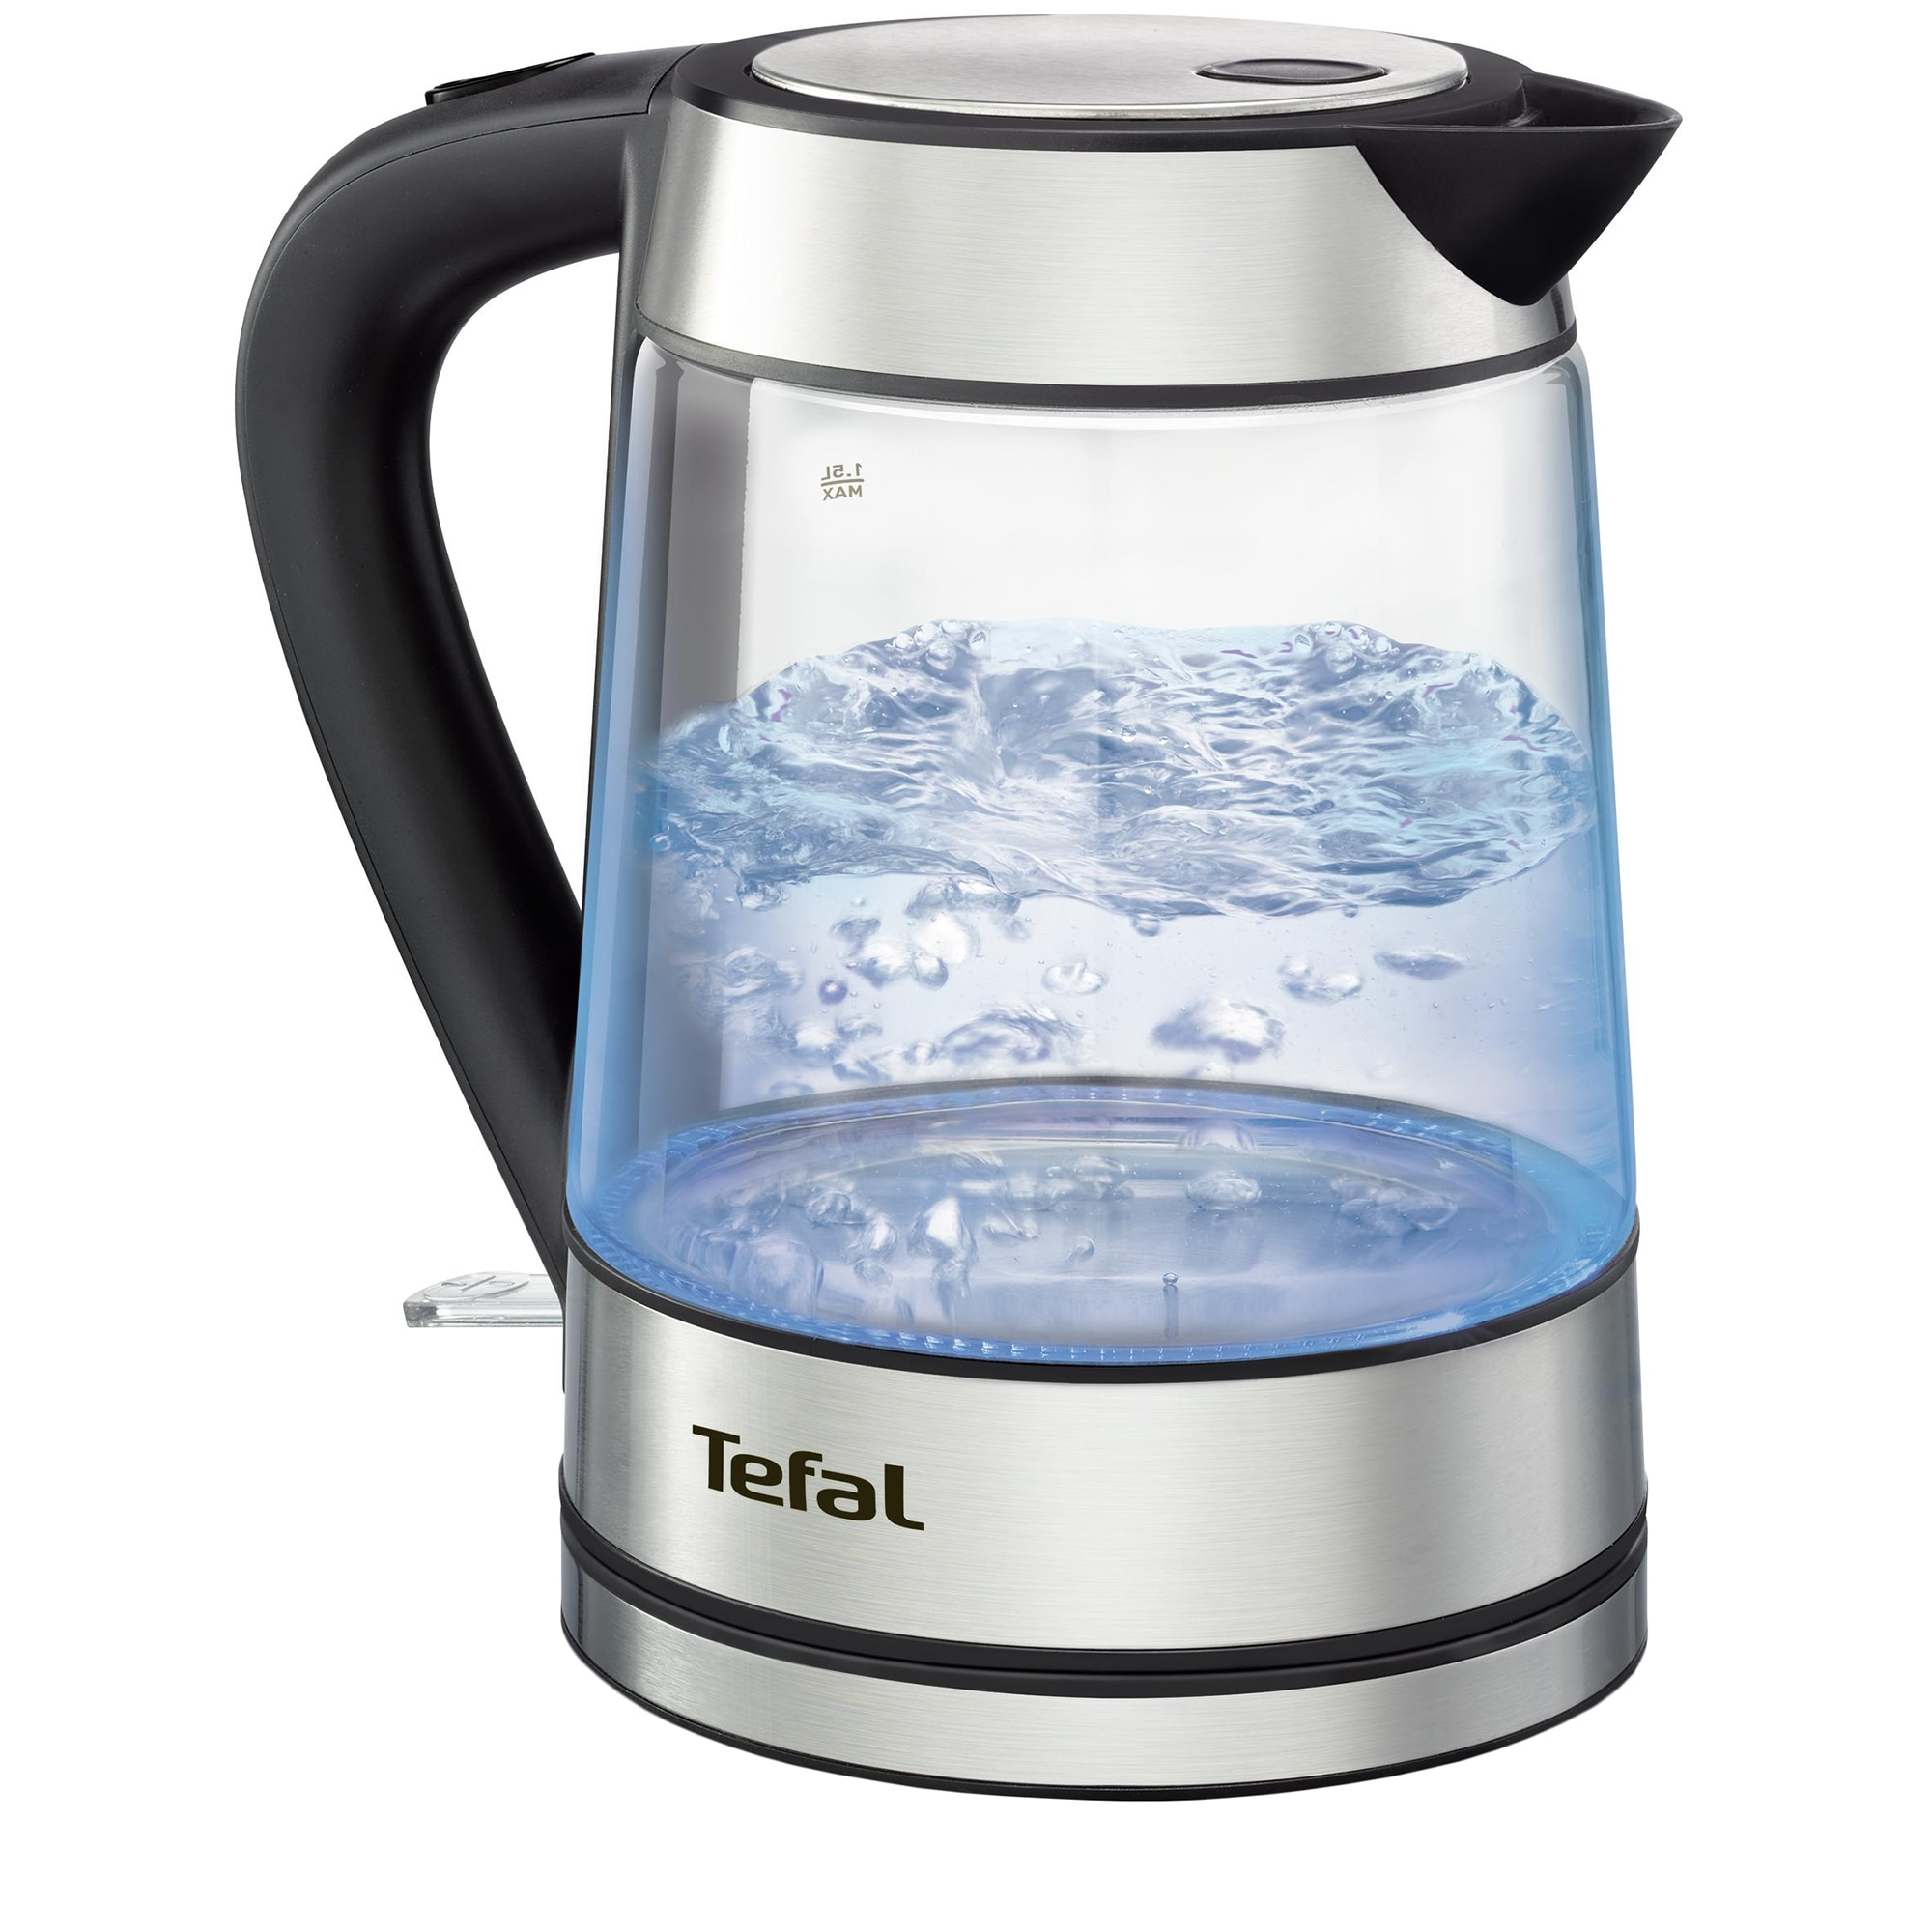 Fotografie Fierbator de apa Tefal Glass Kettle KI730D30, 2400W, 1.7L, Argintiu